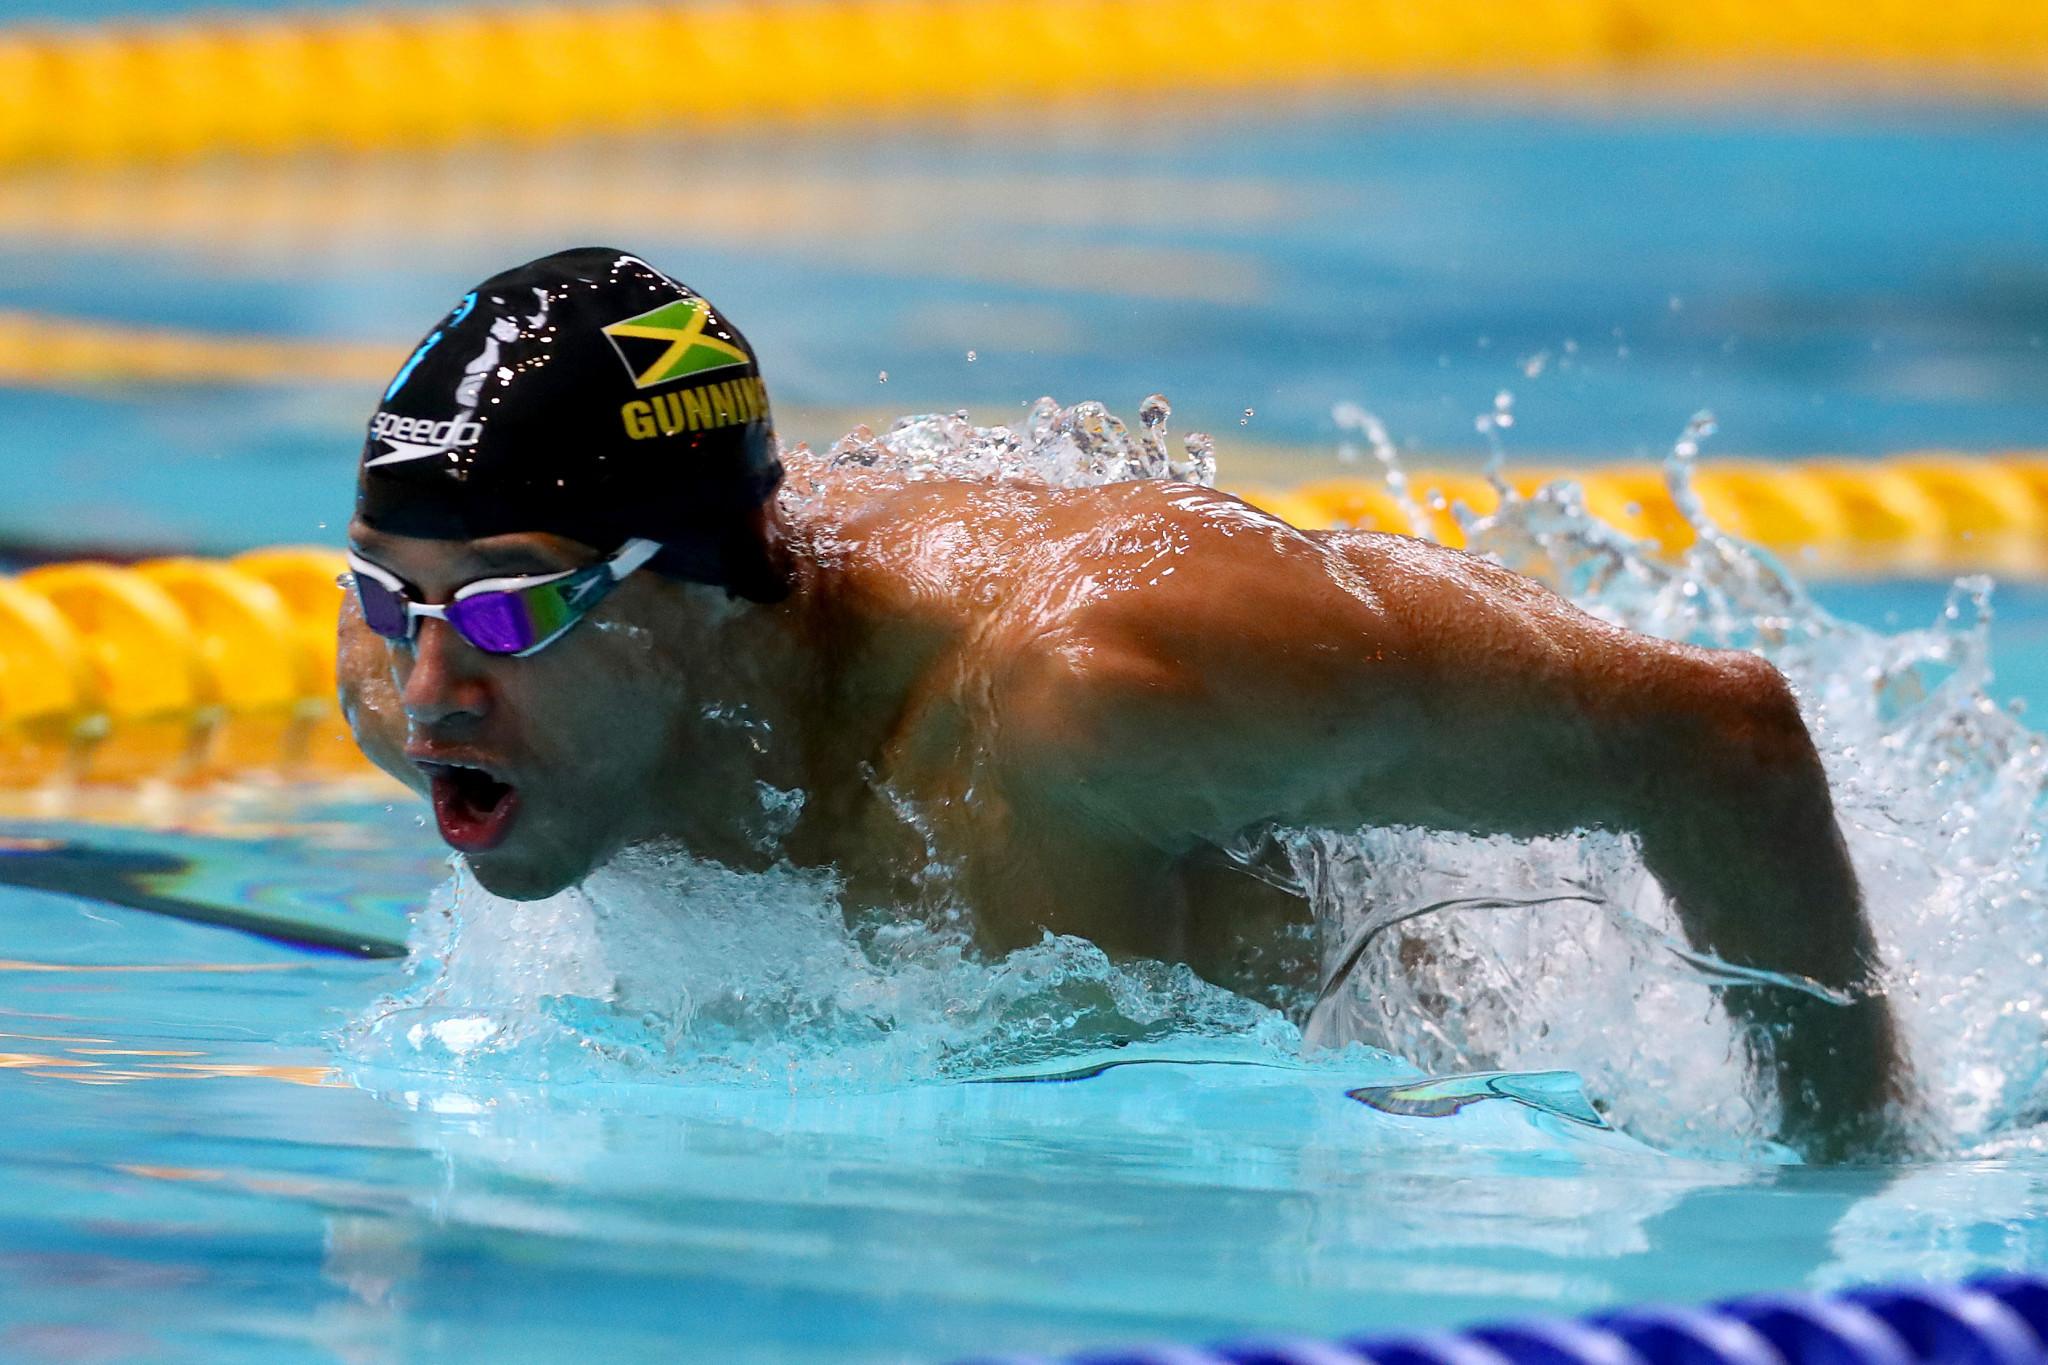 Birmingham 2022 podcast celebrates Pride Month with Jamaican swimmer Gunning